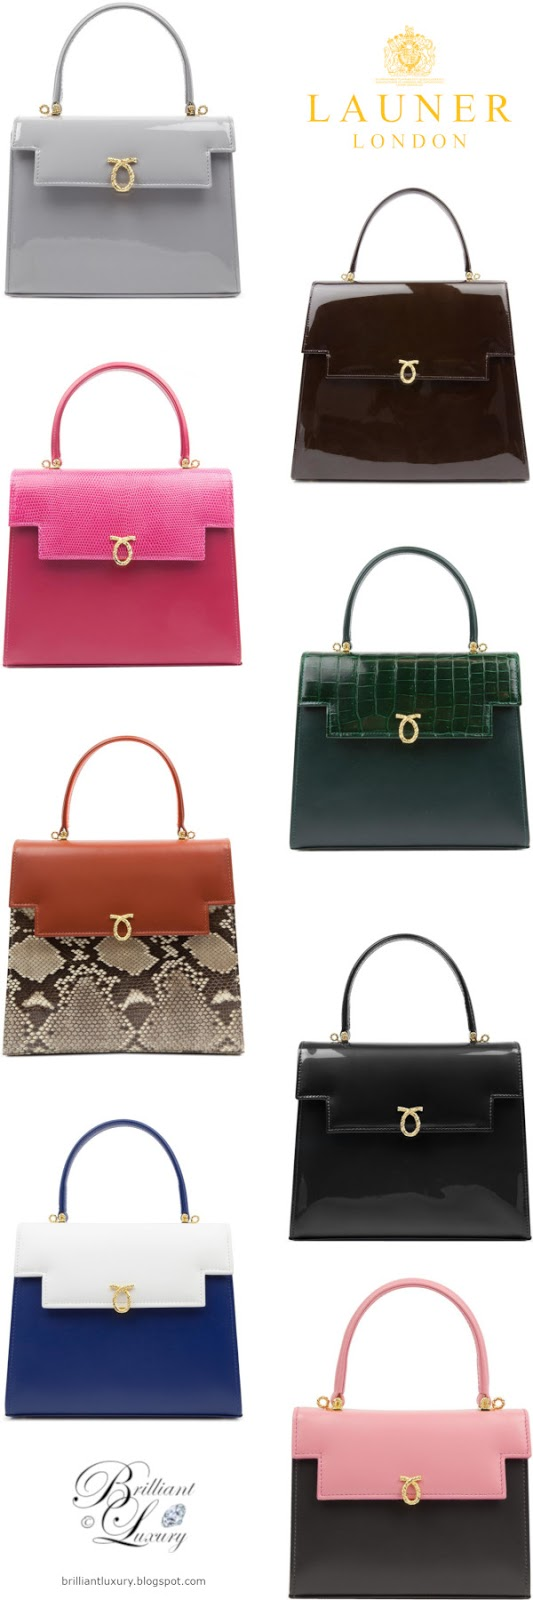 Brilliant Luxury ♦ Launer London Royal Handbags